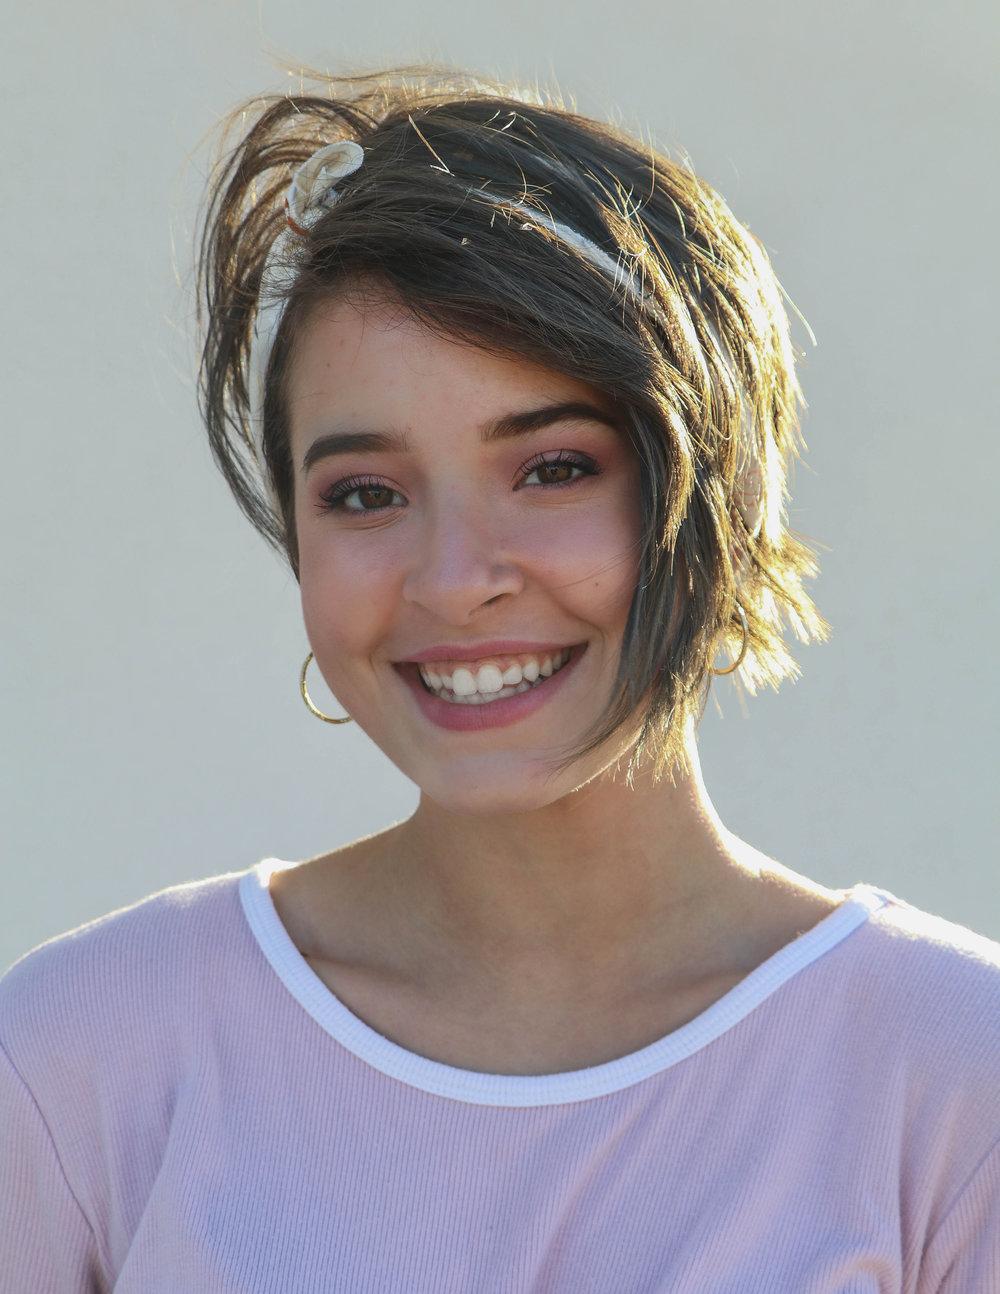 Emily Batista